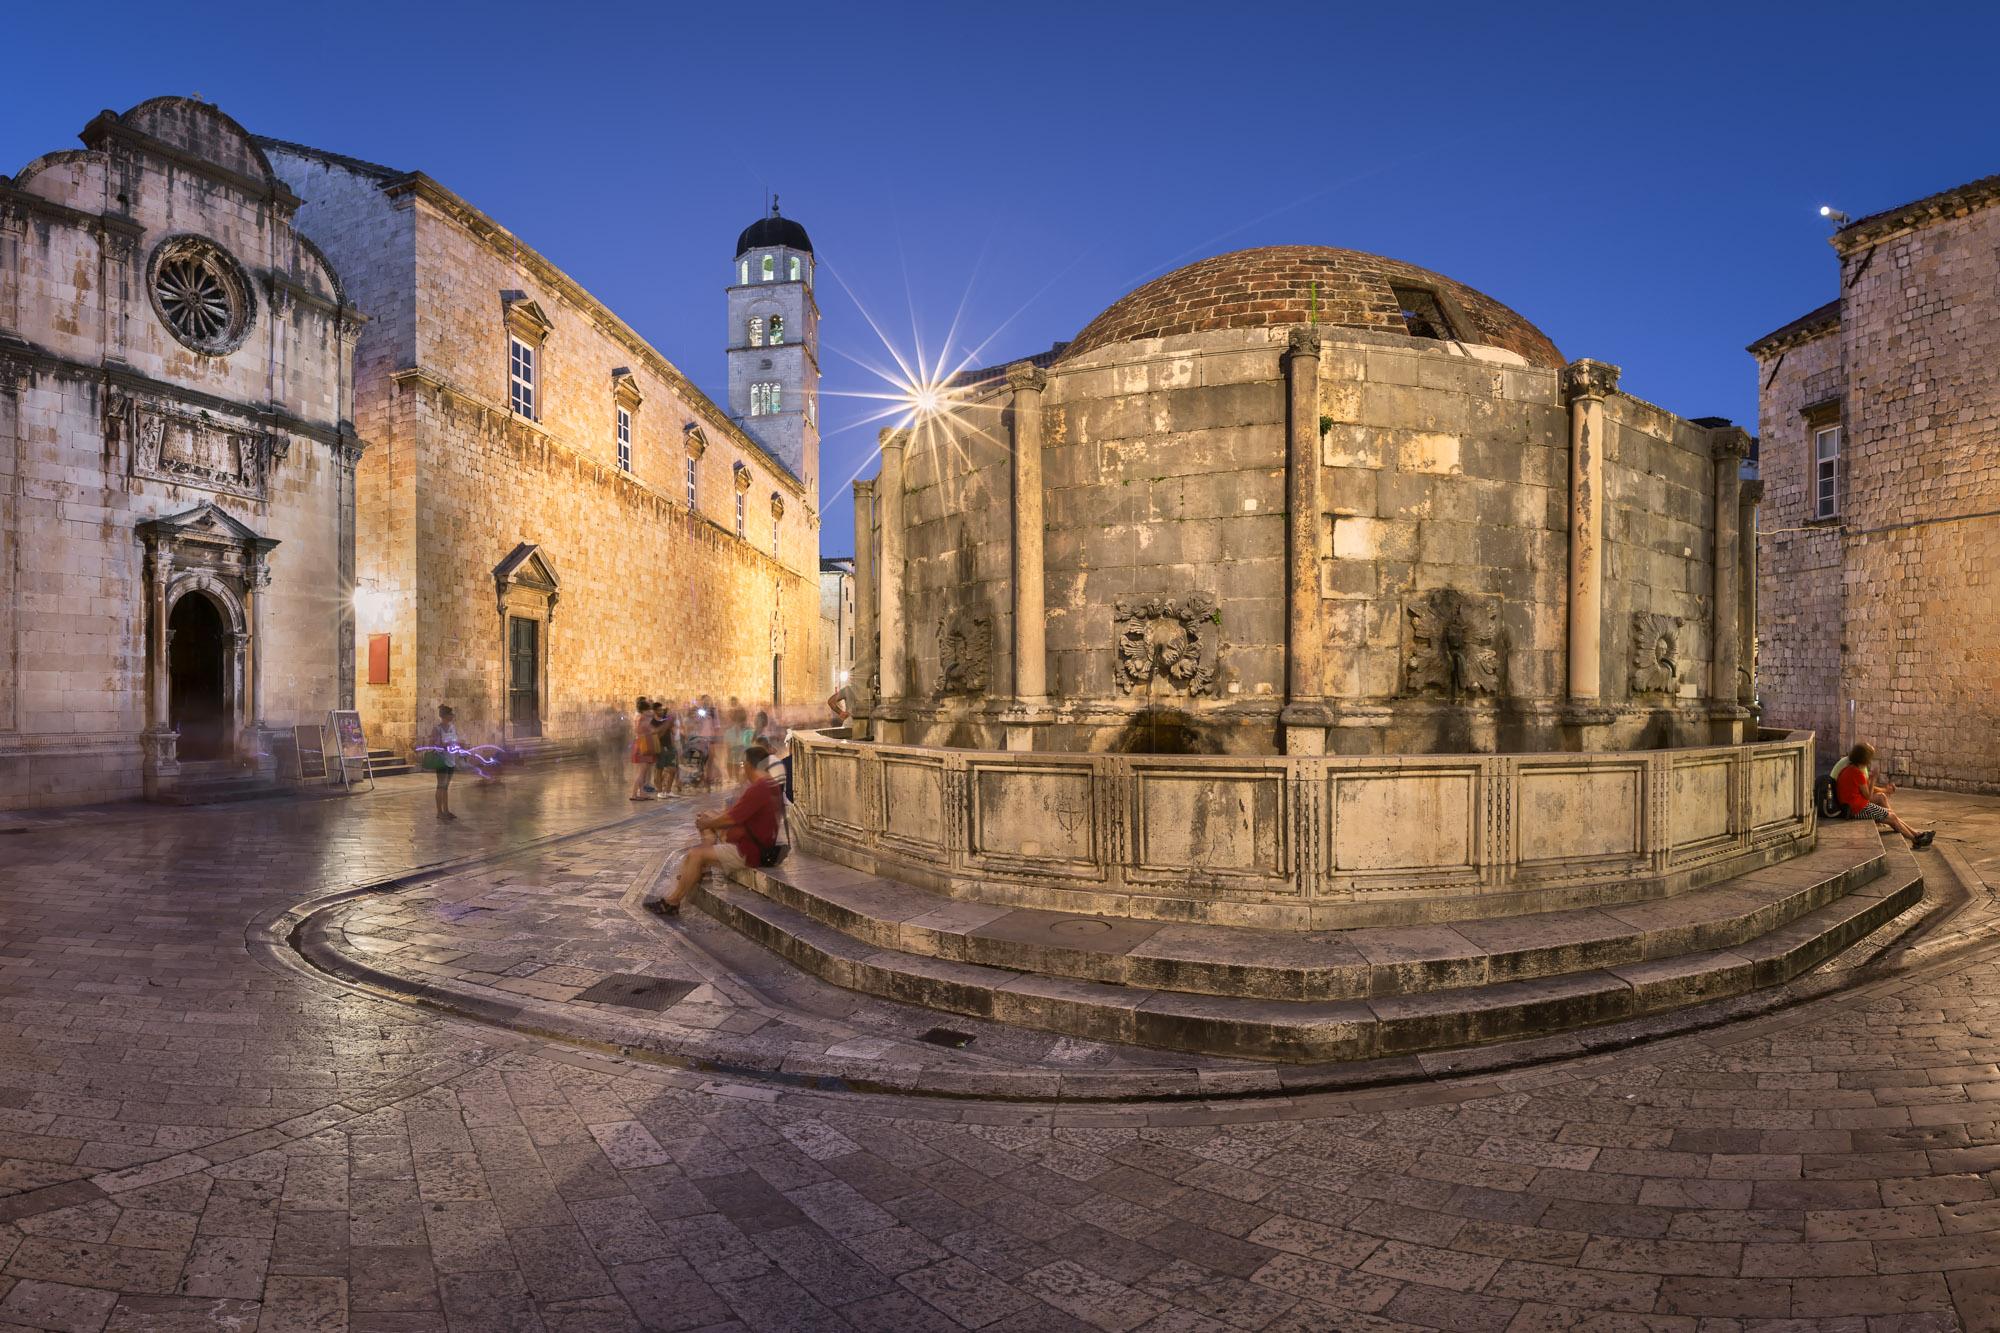 Great Onofrio Fountain in Dubrovnik, Croatia